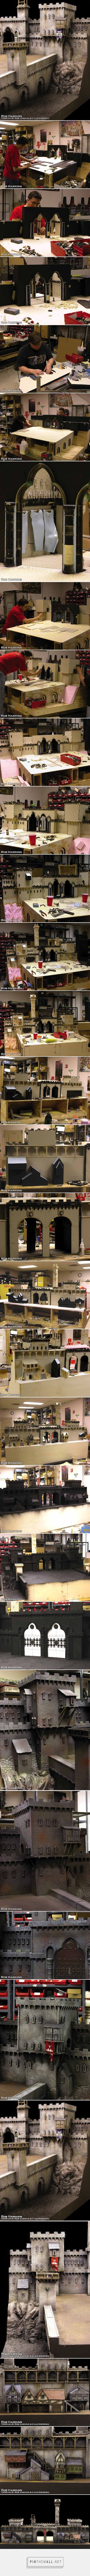 Rob Hawkins Hobby: Remembering Middenheim - created via http://pinthemall.net